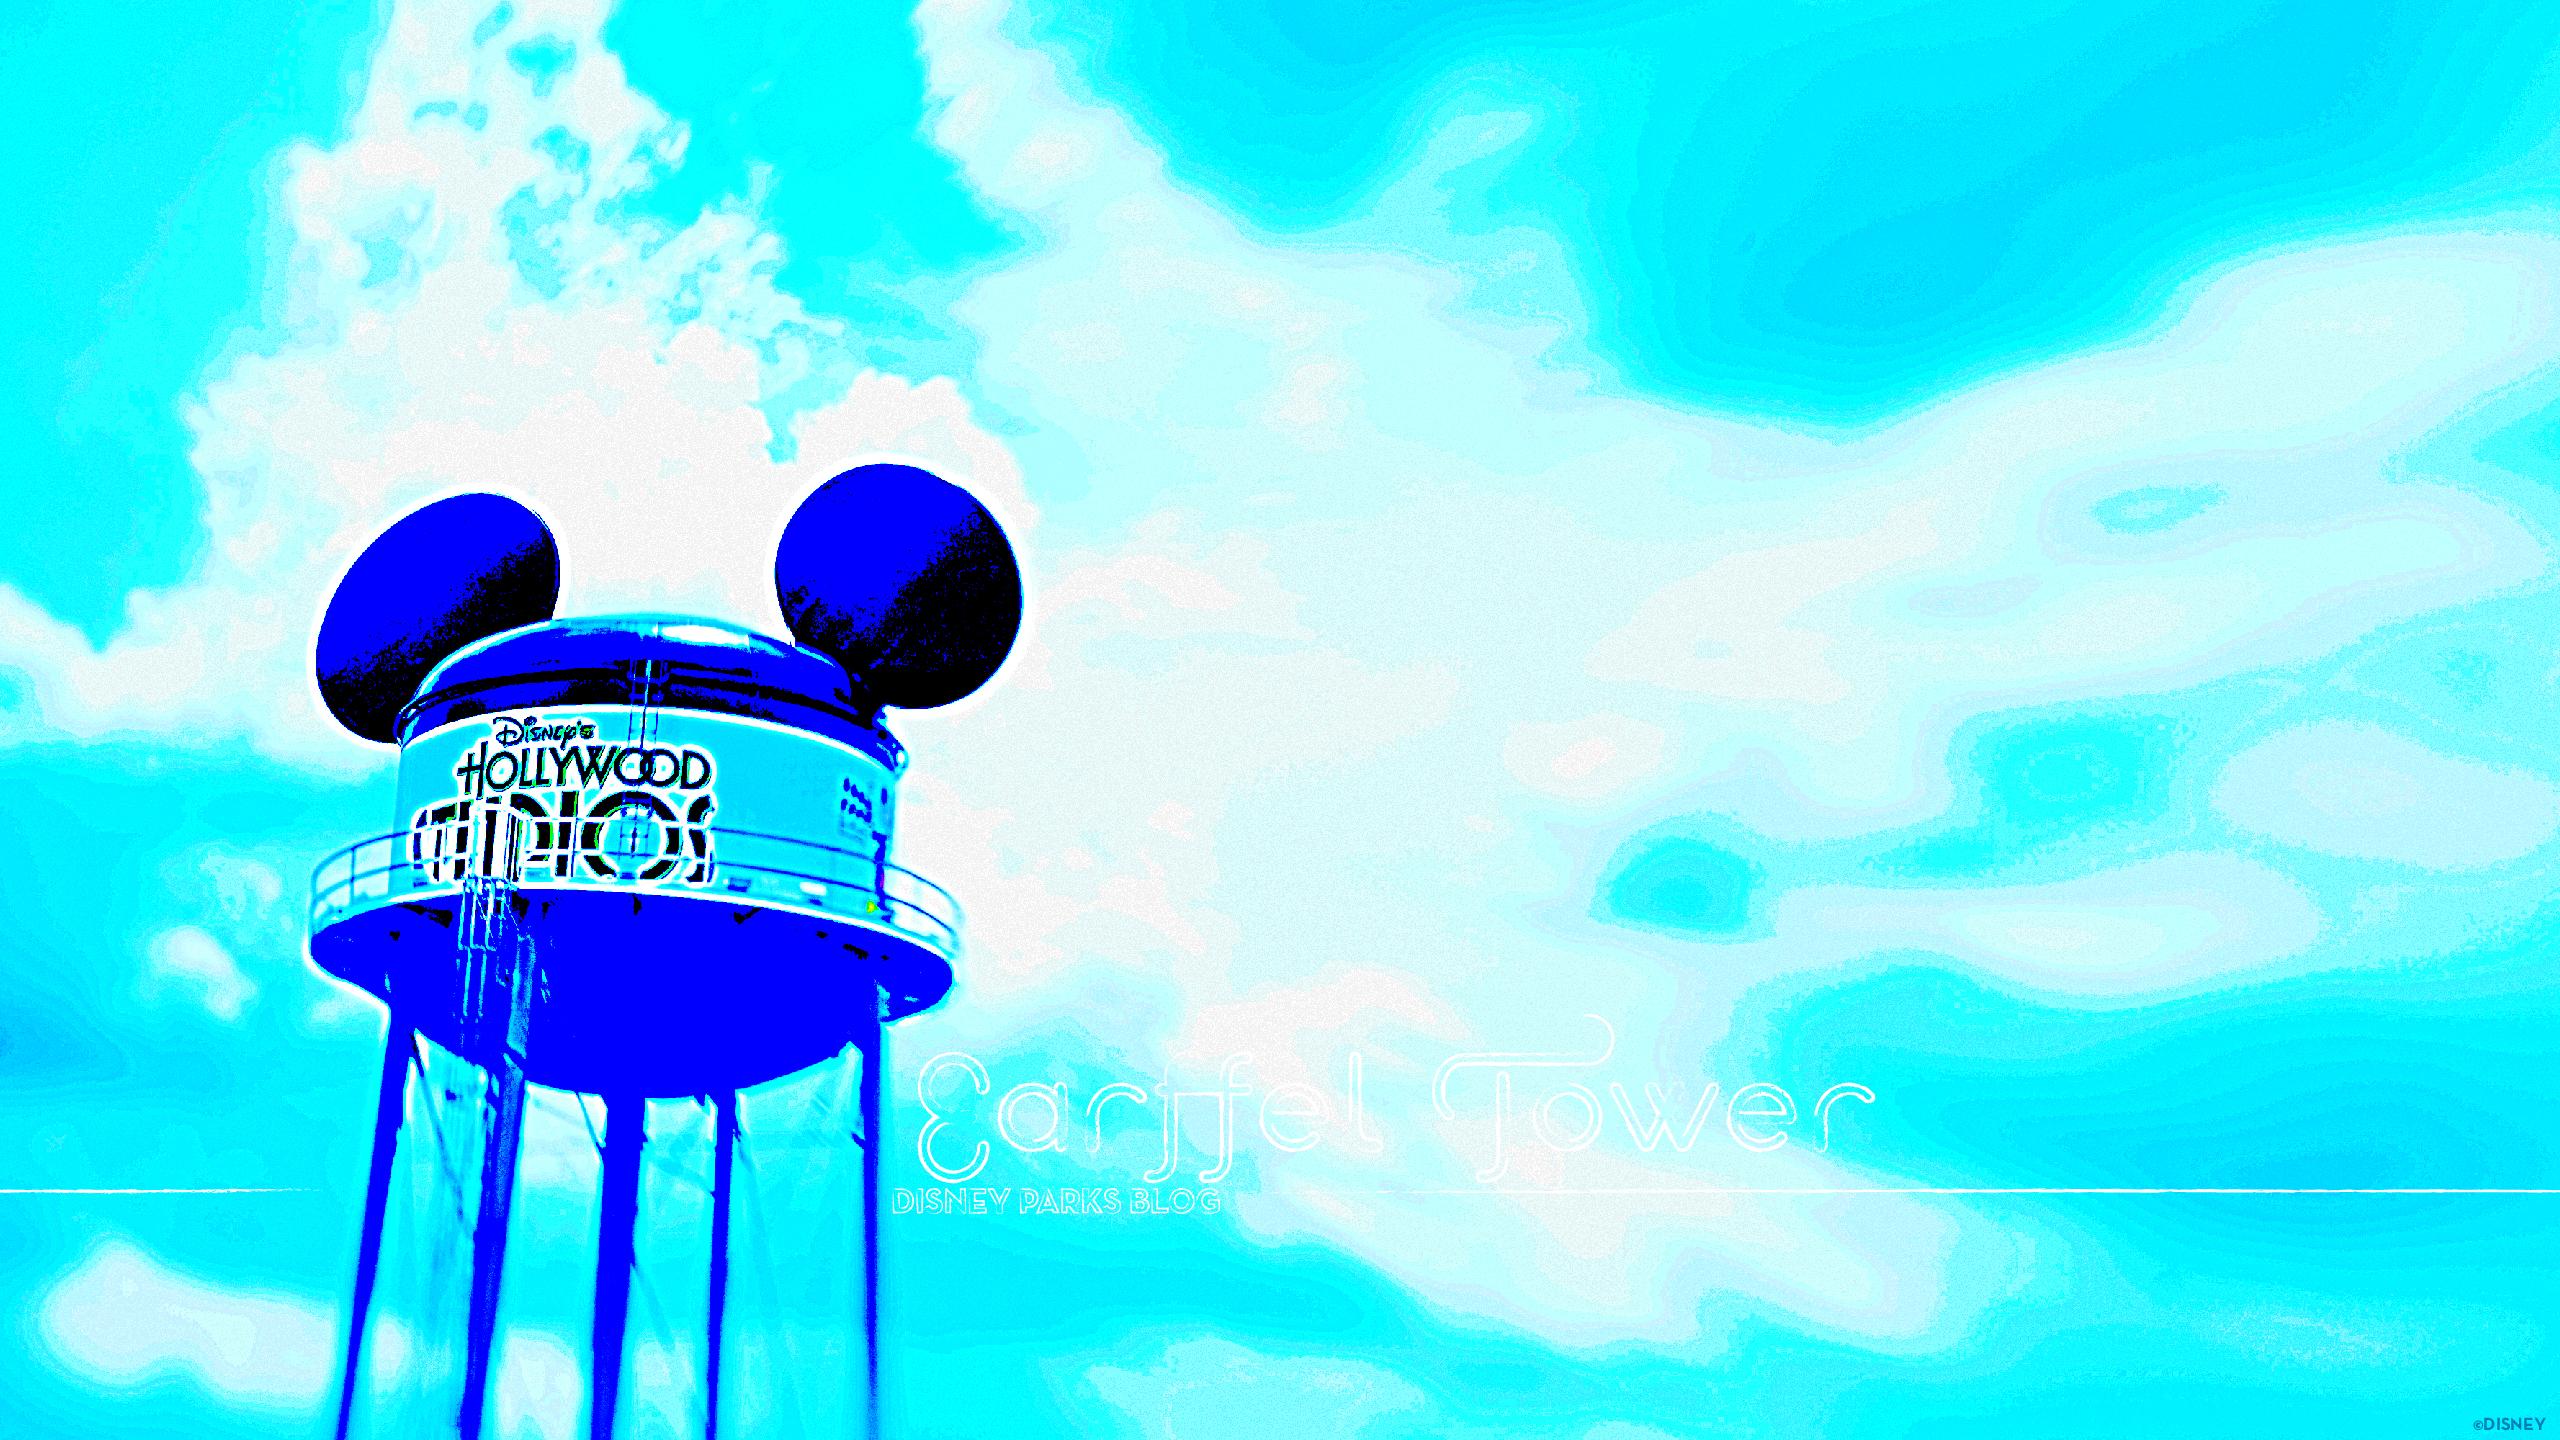 Earffel Tower at Disneys Hollywood Studios 2560x1440